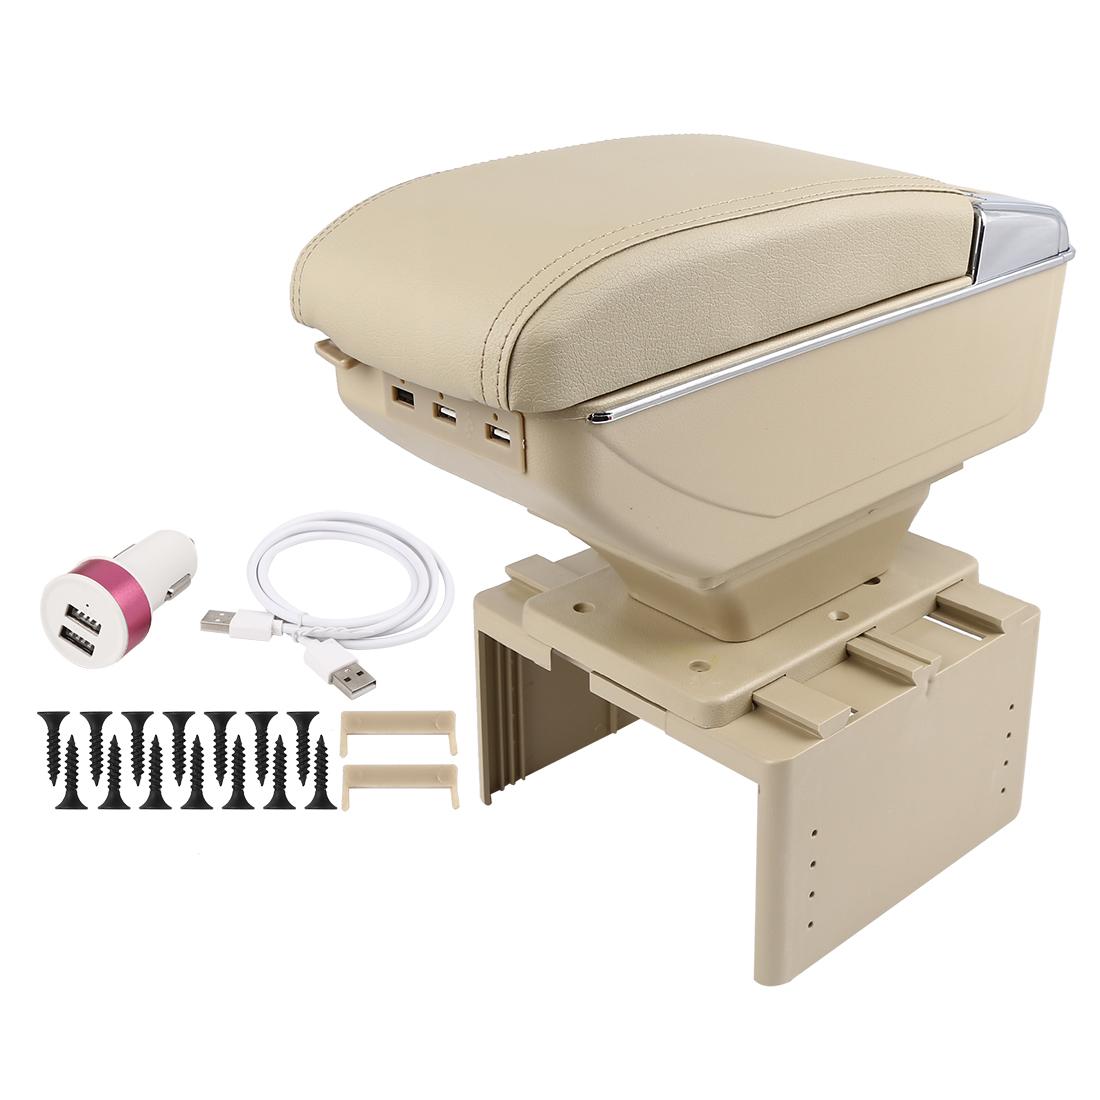 Universal Adjustable Single Layer Design Car Center Armrest Box w/ LED 7 USB